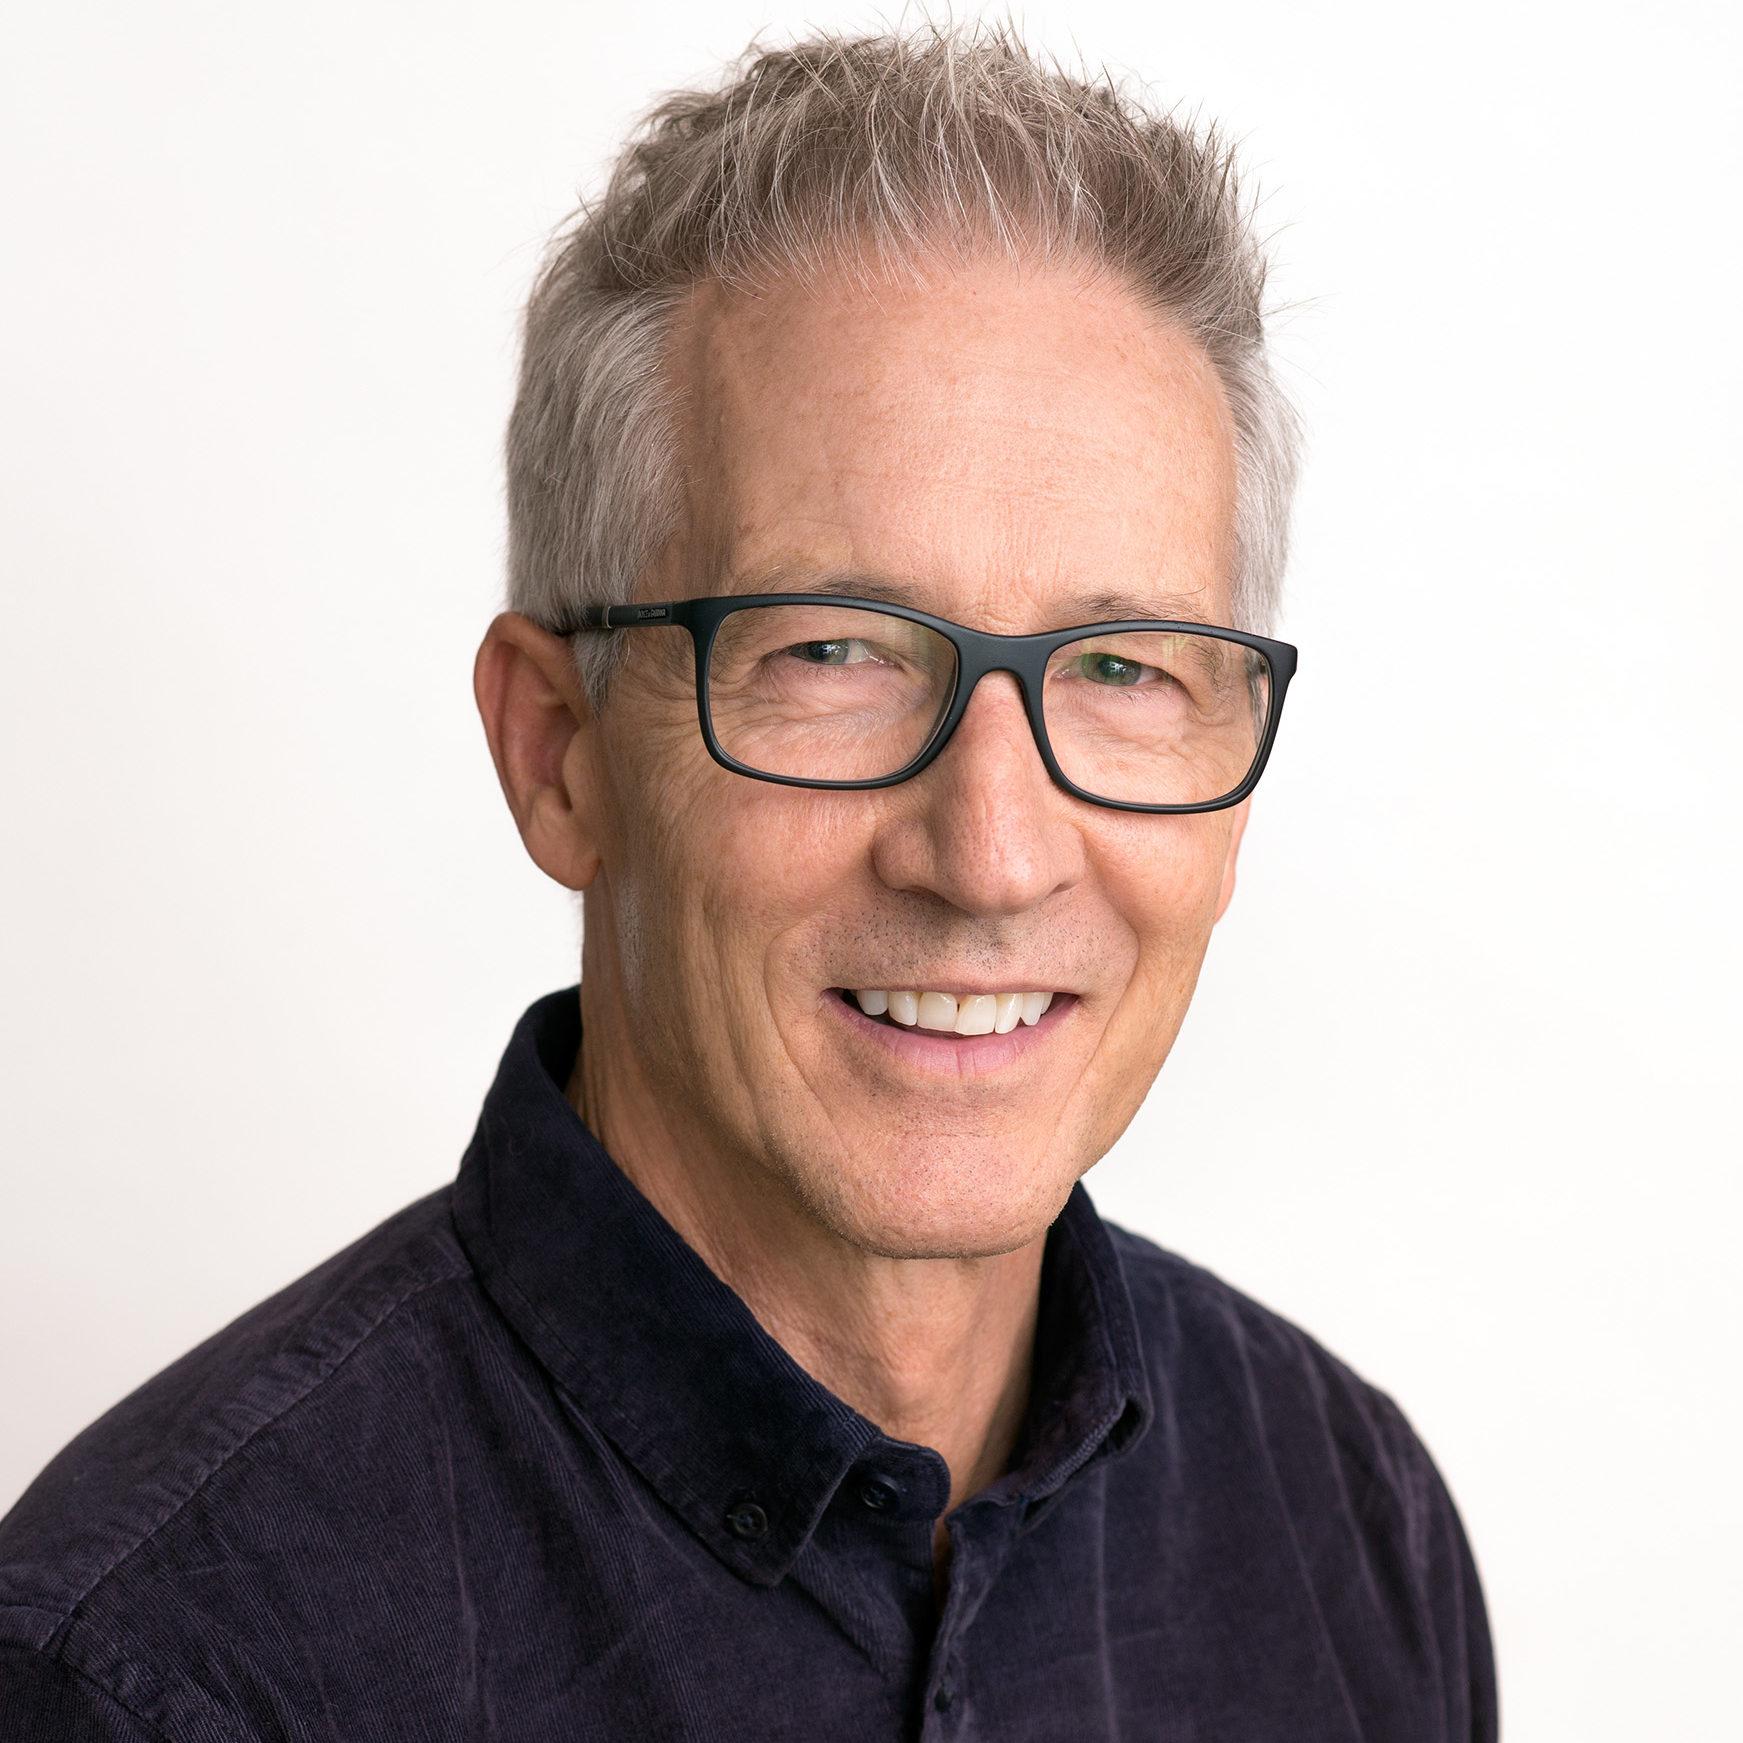 Denny Reinert sixgill Vice President, Enterprise Sales